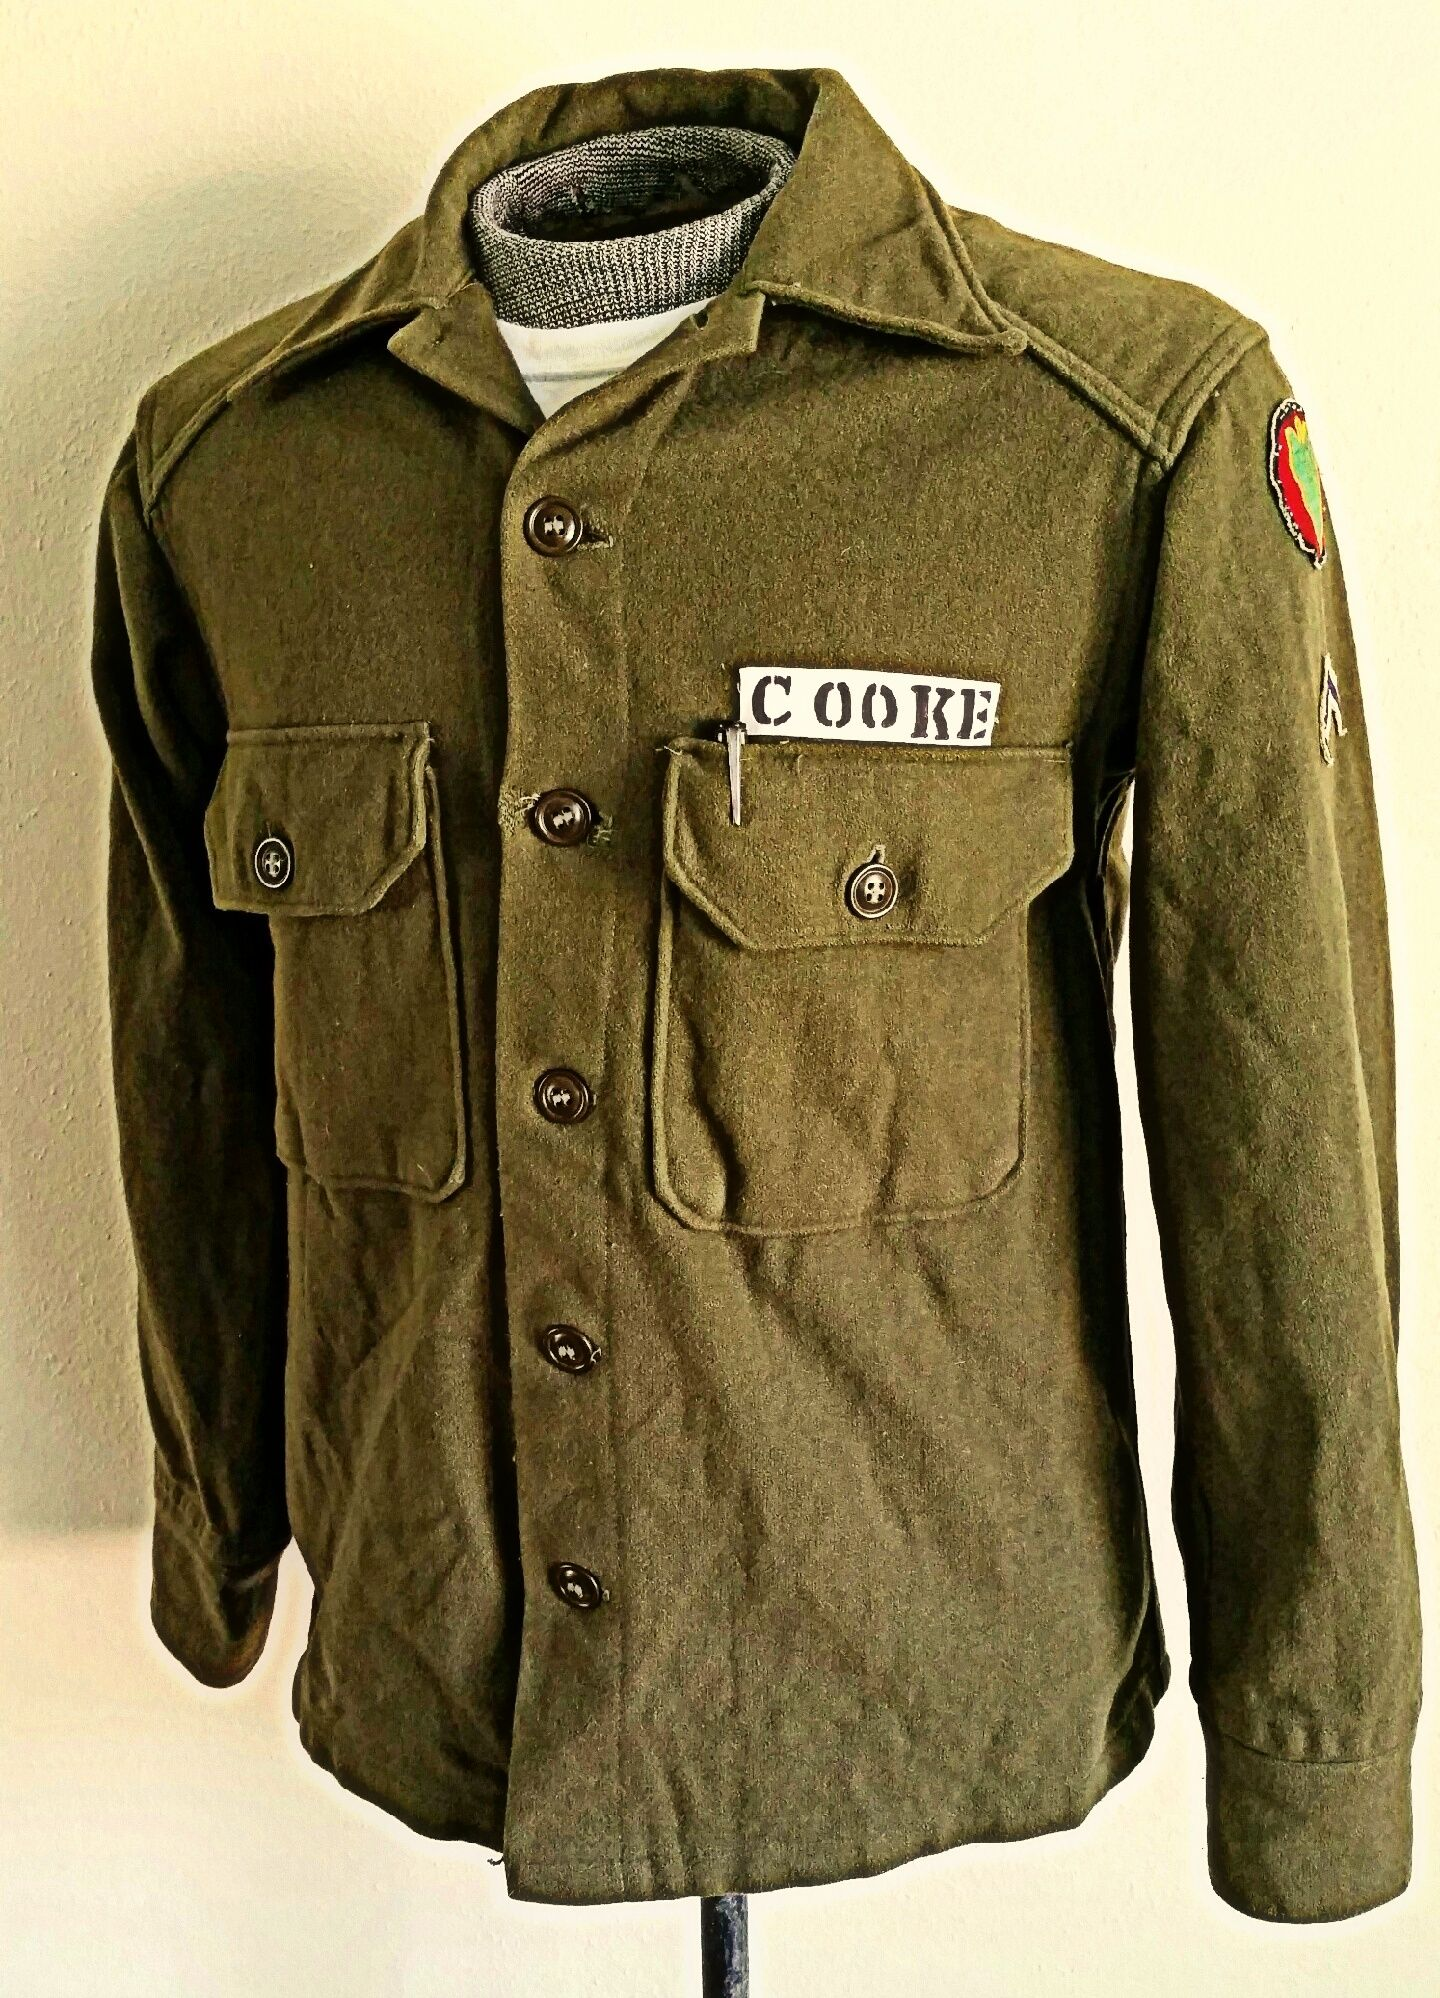 Korean War Us Army M1951 Wool Field Shirt 24th Infantry Division This Shirt Has A Hand Made White Cotton Name Tape Sewn Ov Korean War Military Jacket Shirts